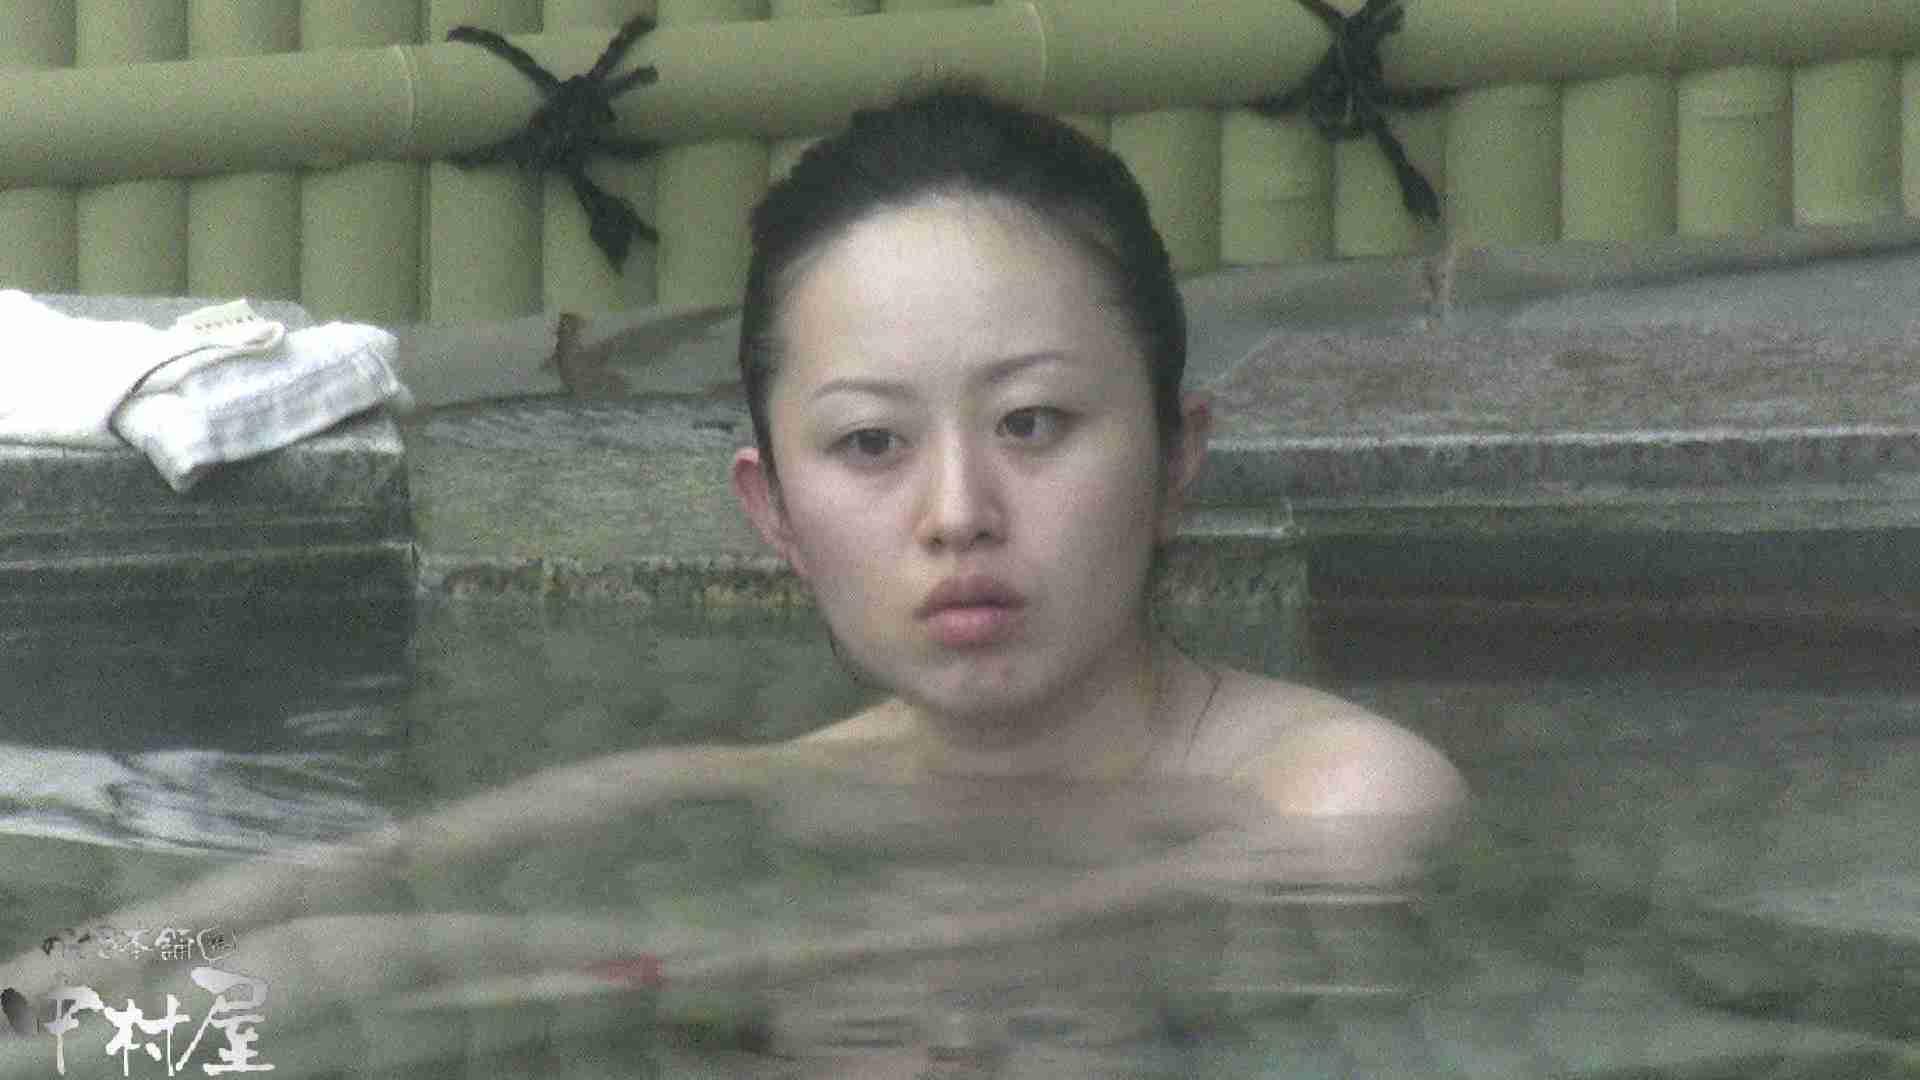 Aquaな露天風呂Vol.912 露天 AV無料動画キャプチャ 62画像 35